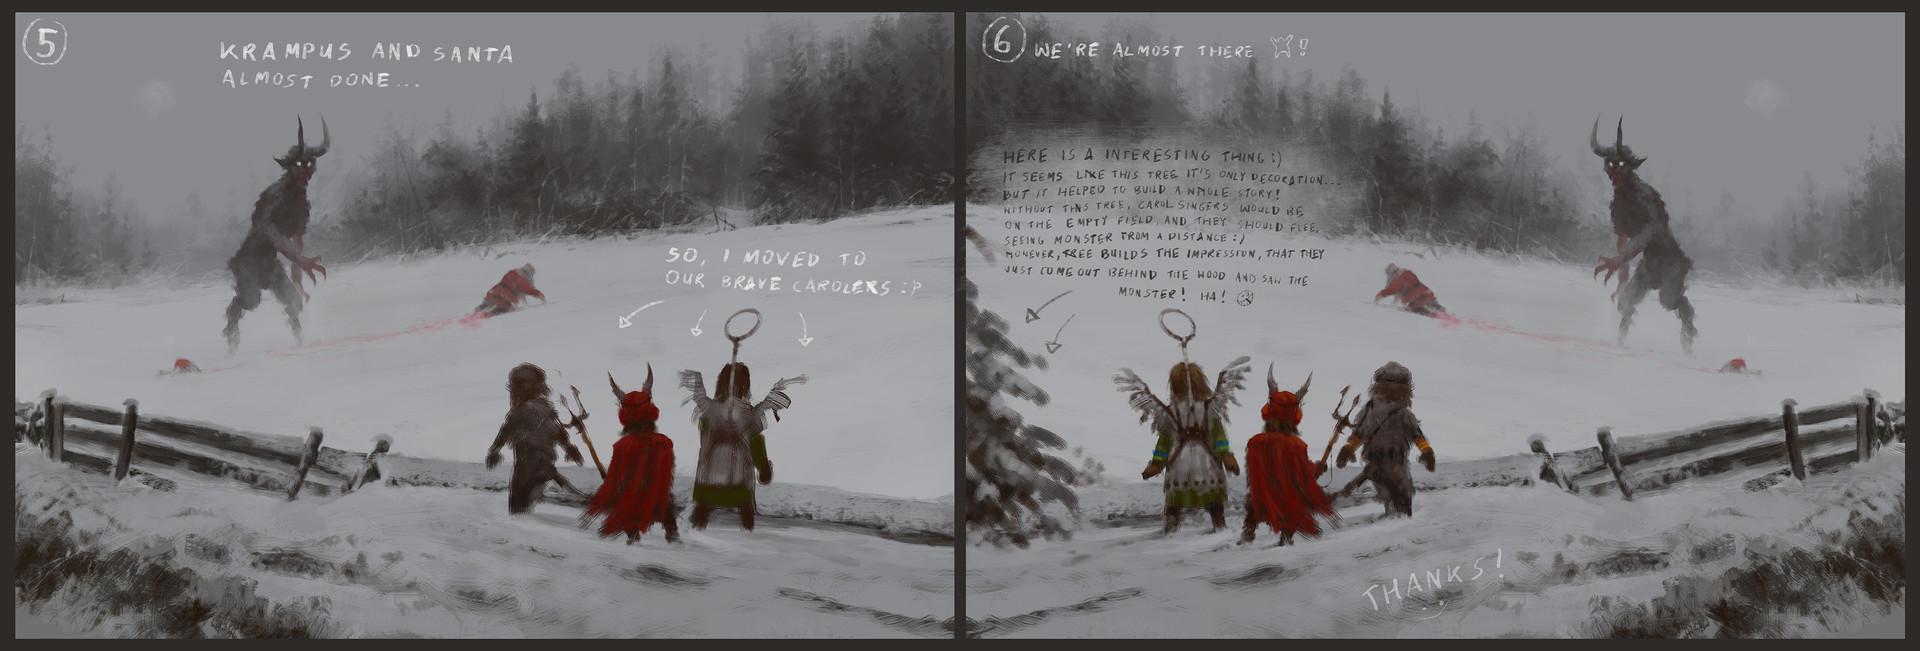 Jakub rozalski santa vs krampus process3